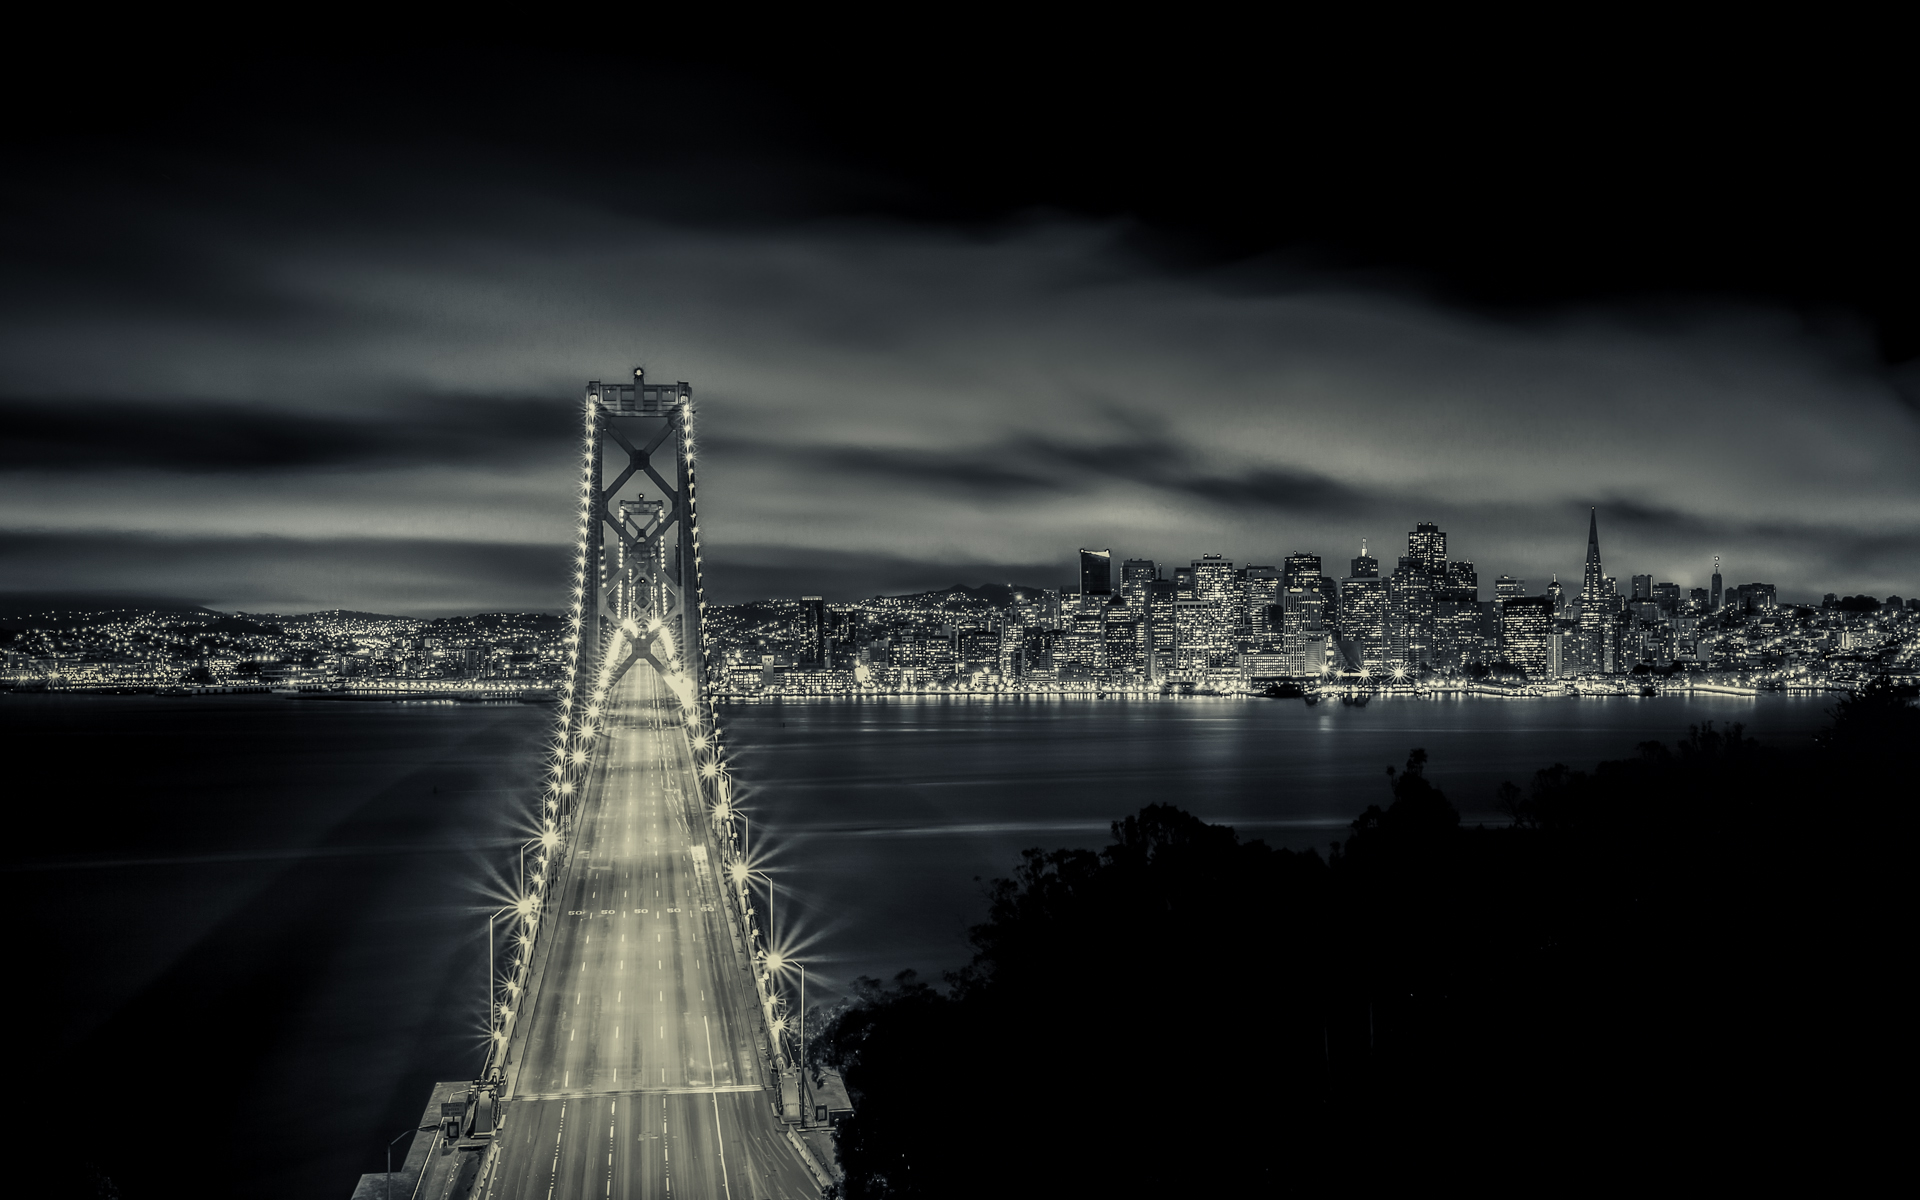 GECENİN VİDEOSU: GOTHAM CITY SF